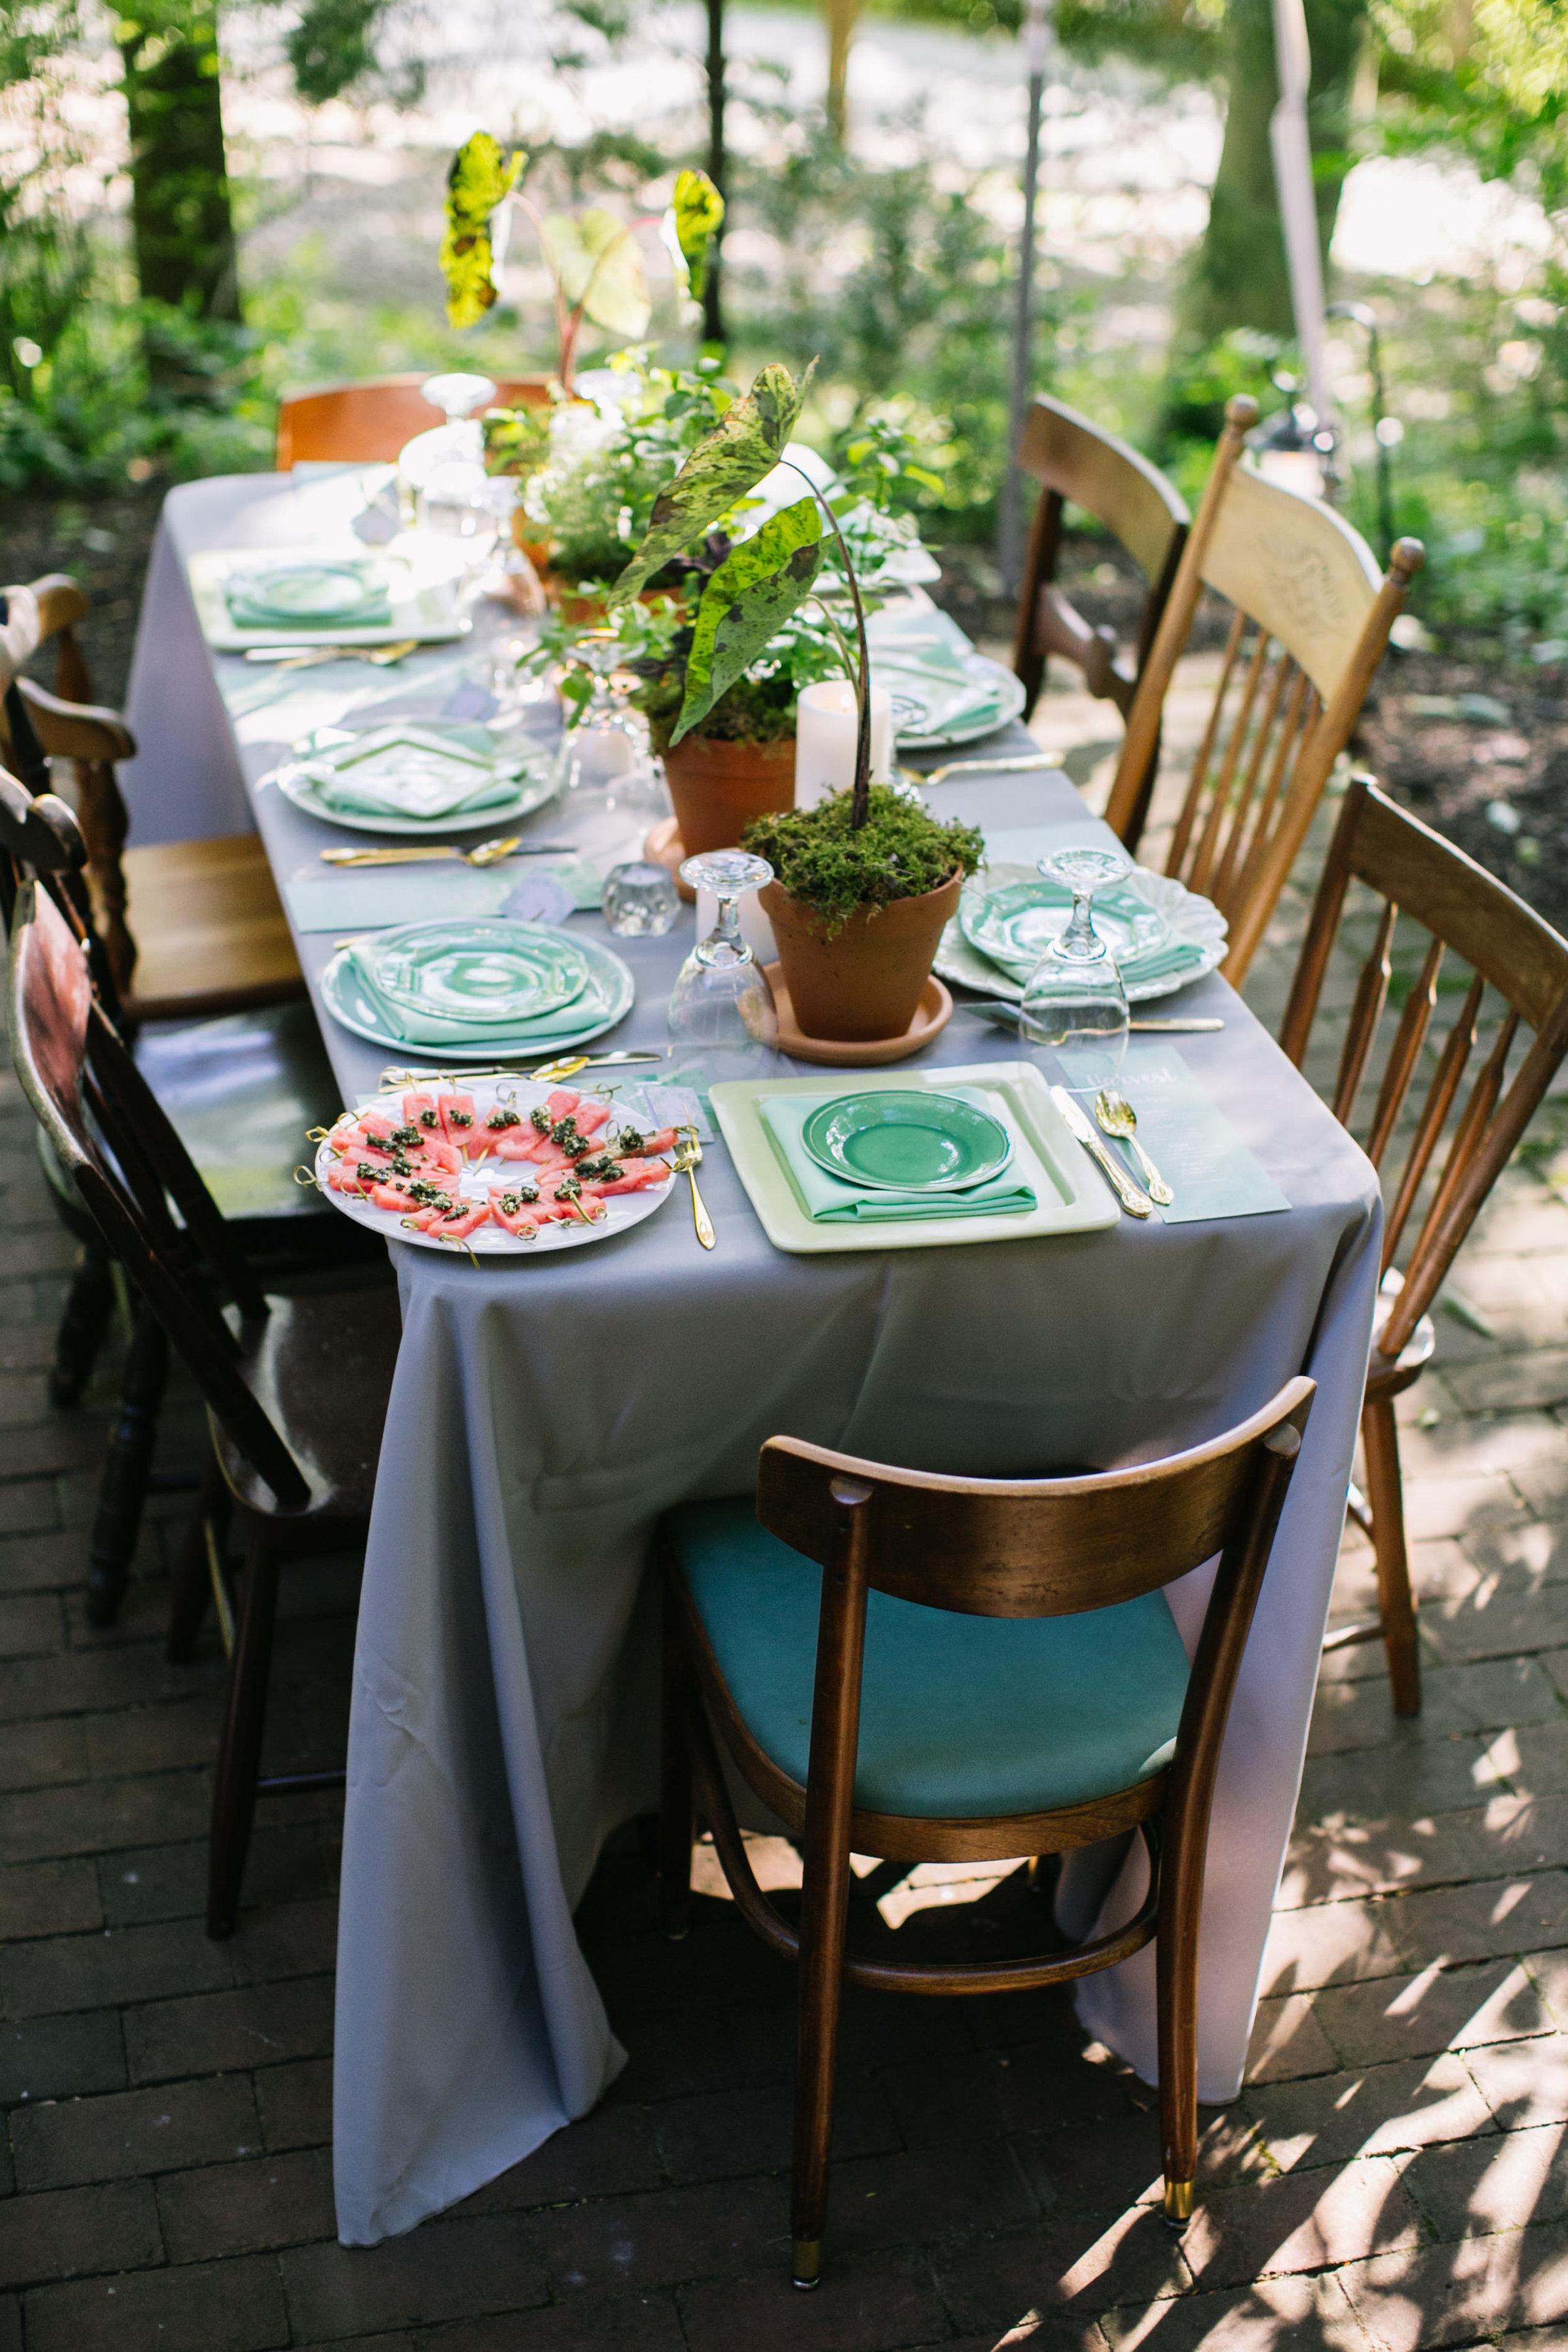 West-Chester-PA-Faunbrook-Harvest-Dinner-Series-Mint-BrittneyRaine-55.JPG